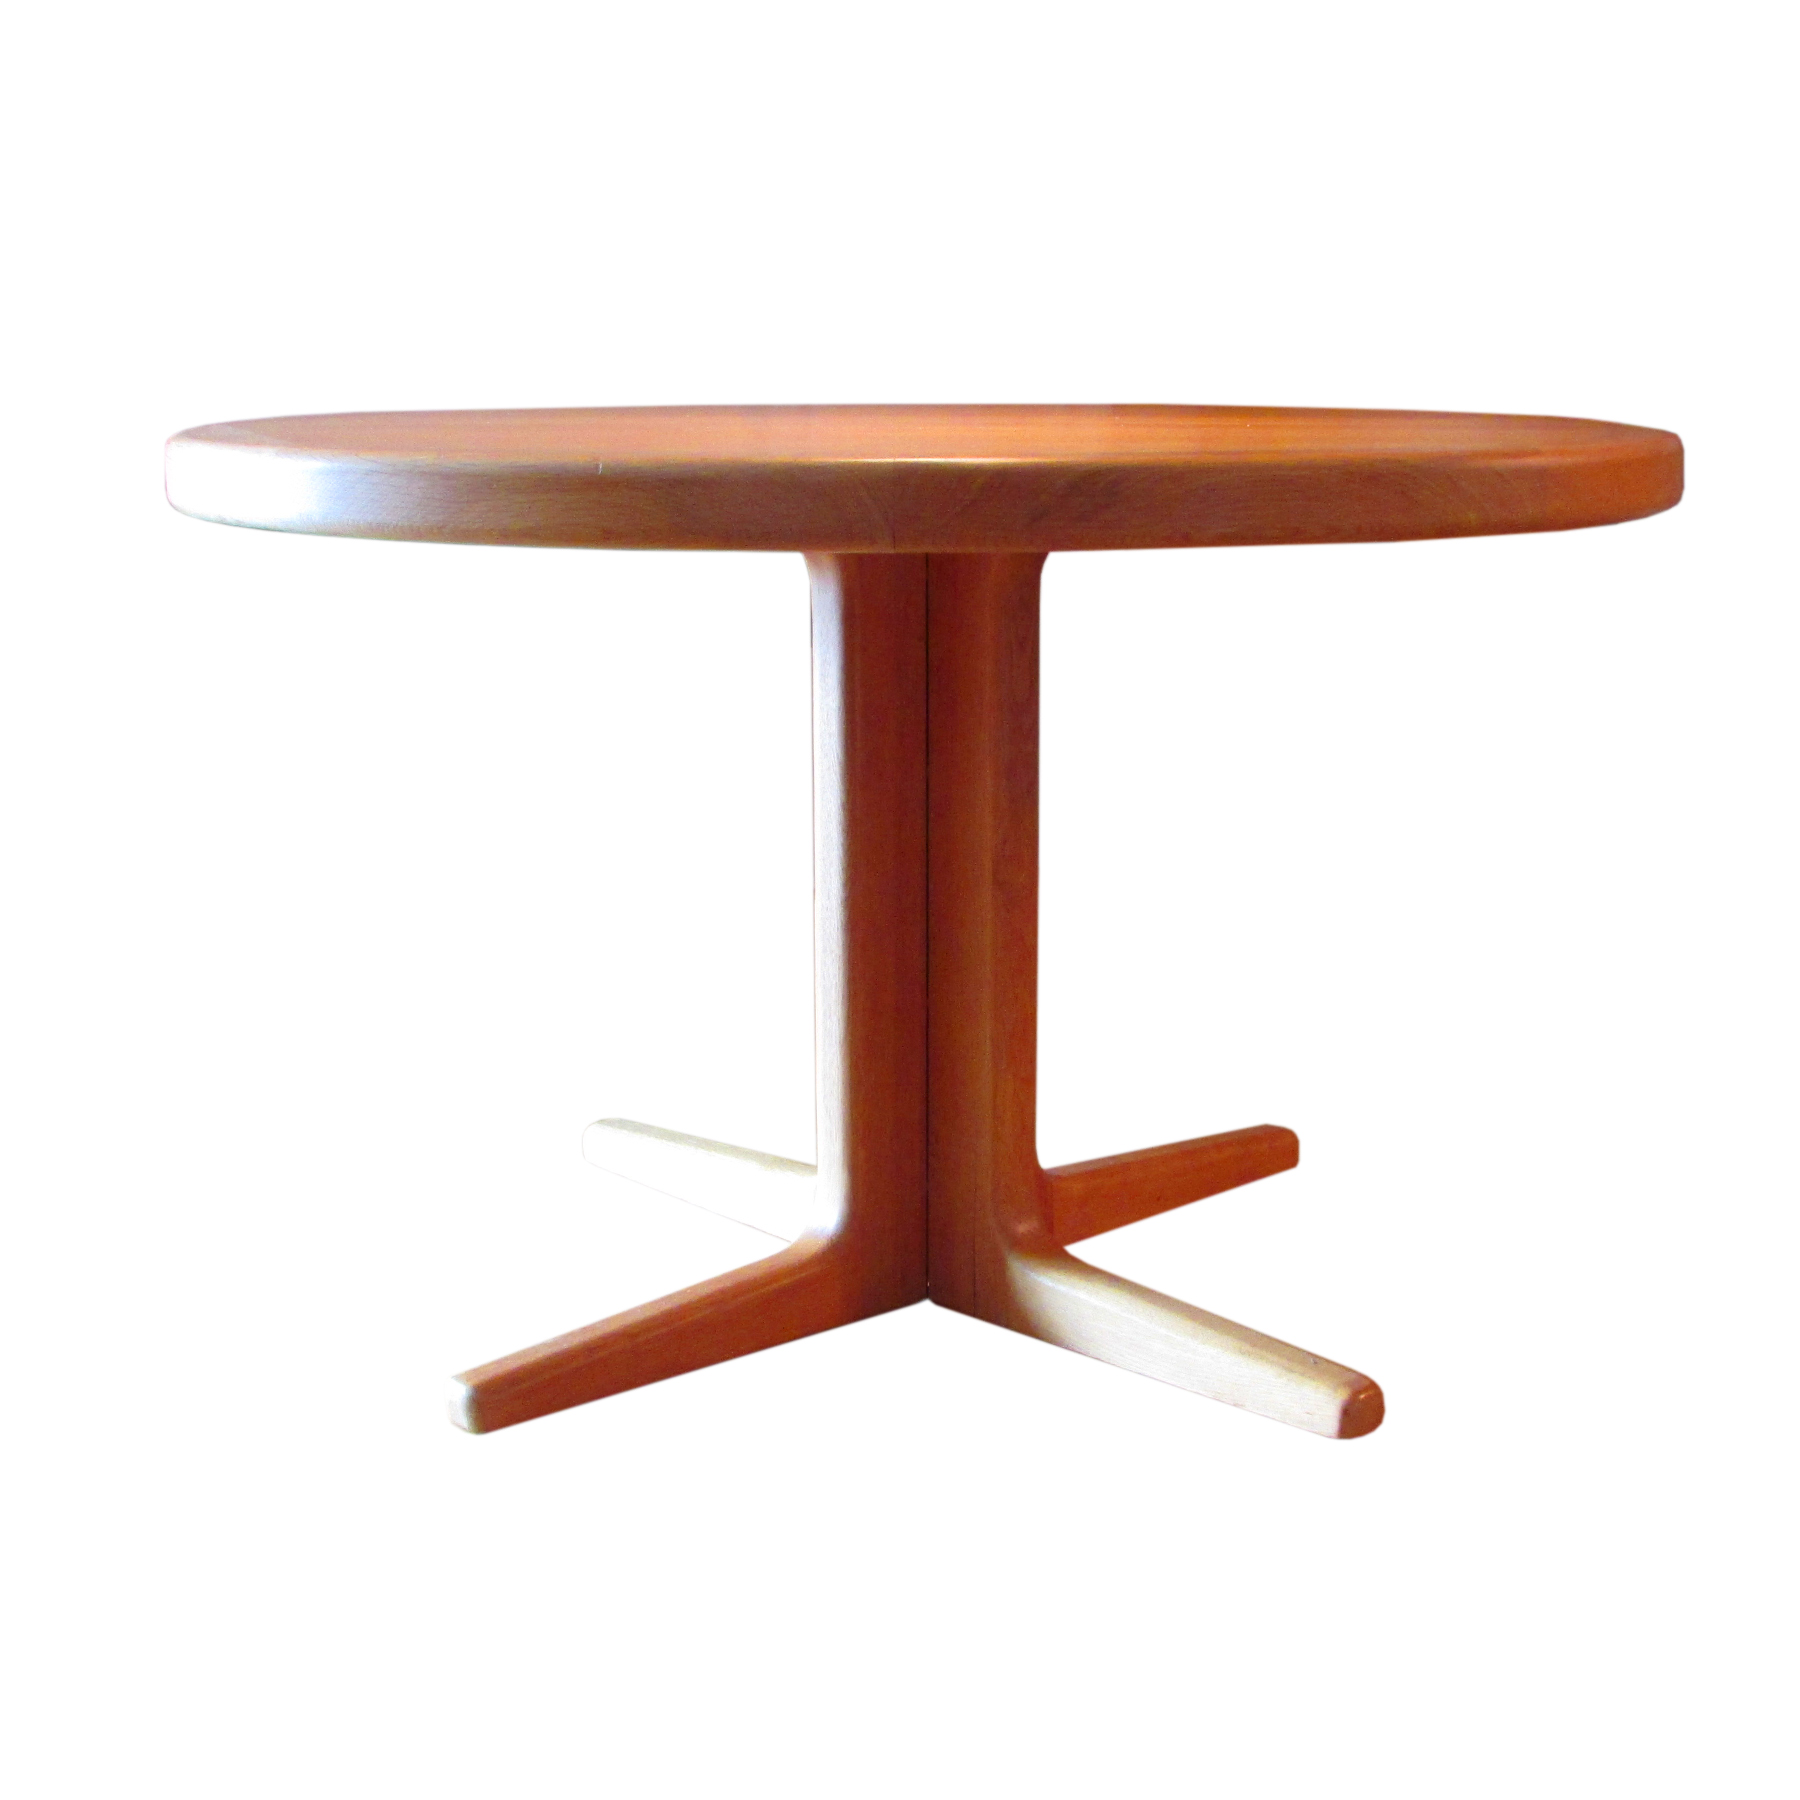 TABLES Artichoke Vintage Furniture : round dining table vejle from artichokevintagefurniture.com size 1800 x 1800 jpeg 384kB